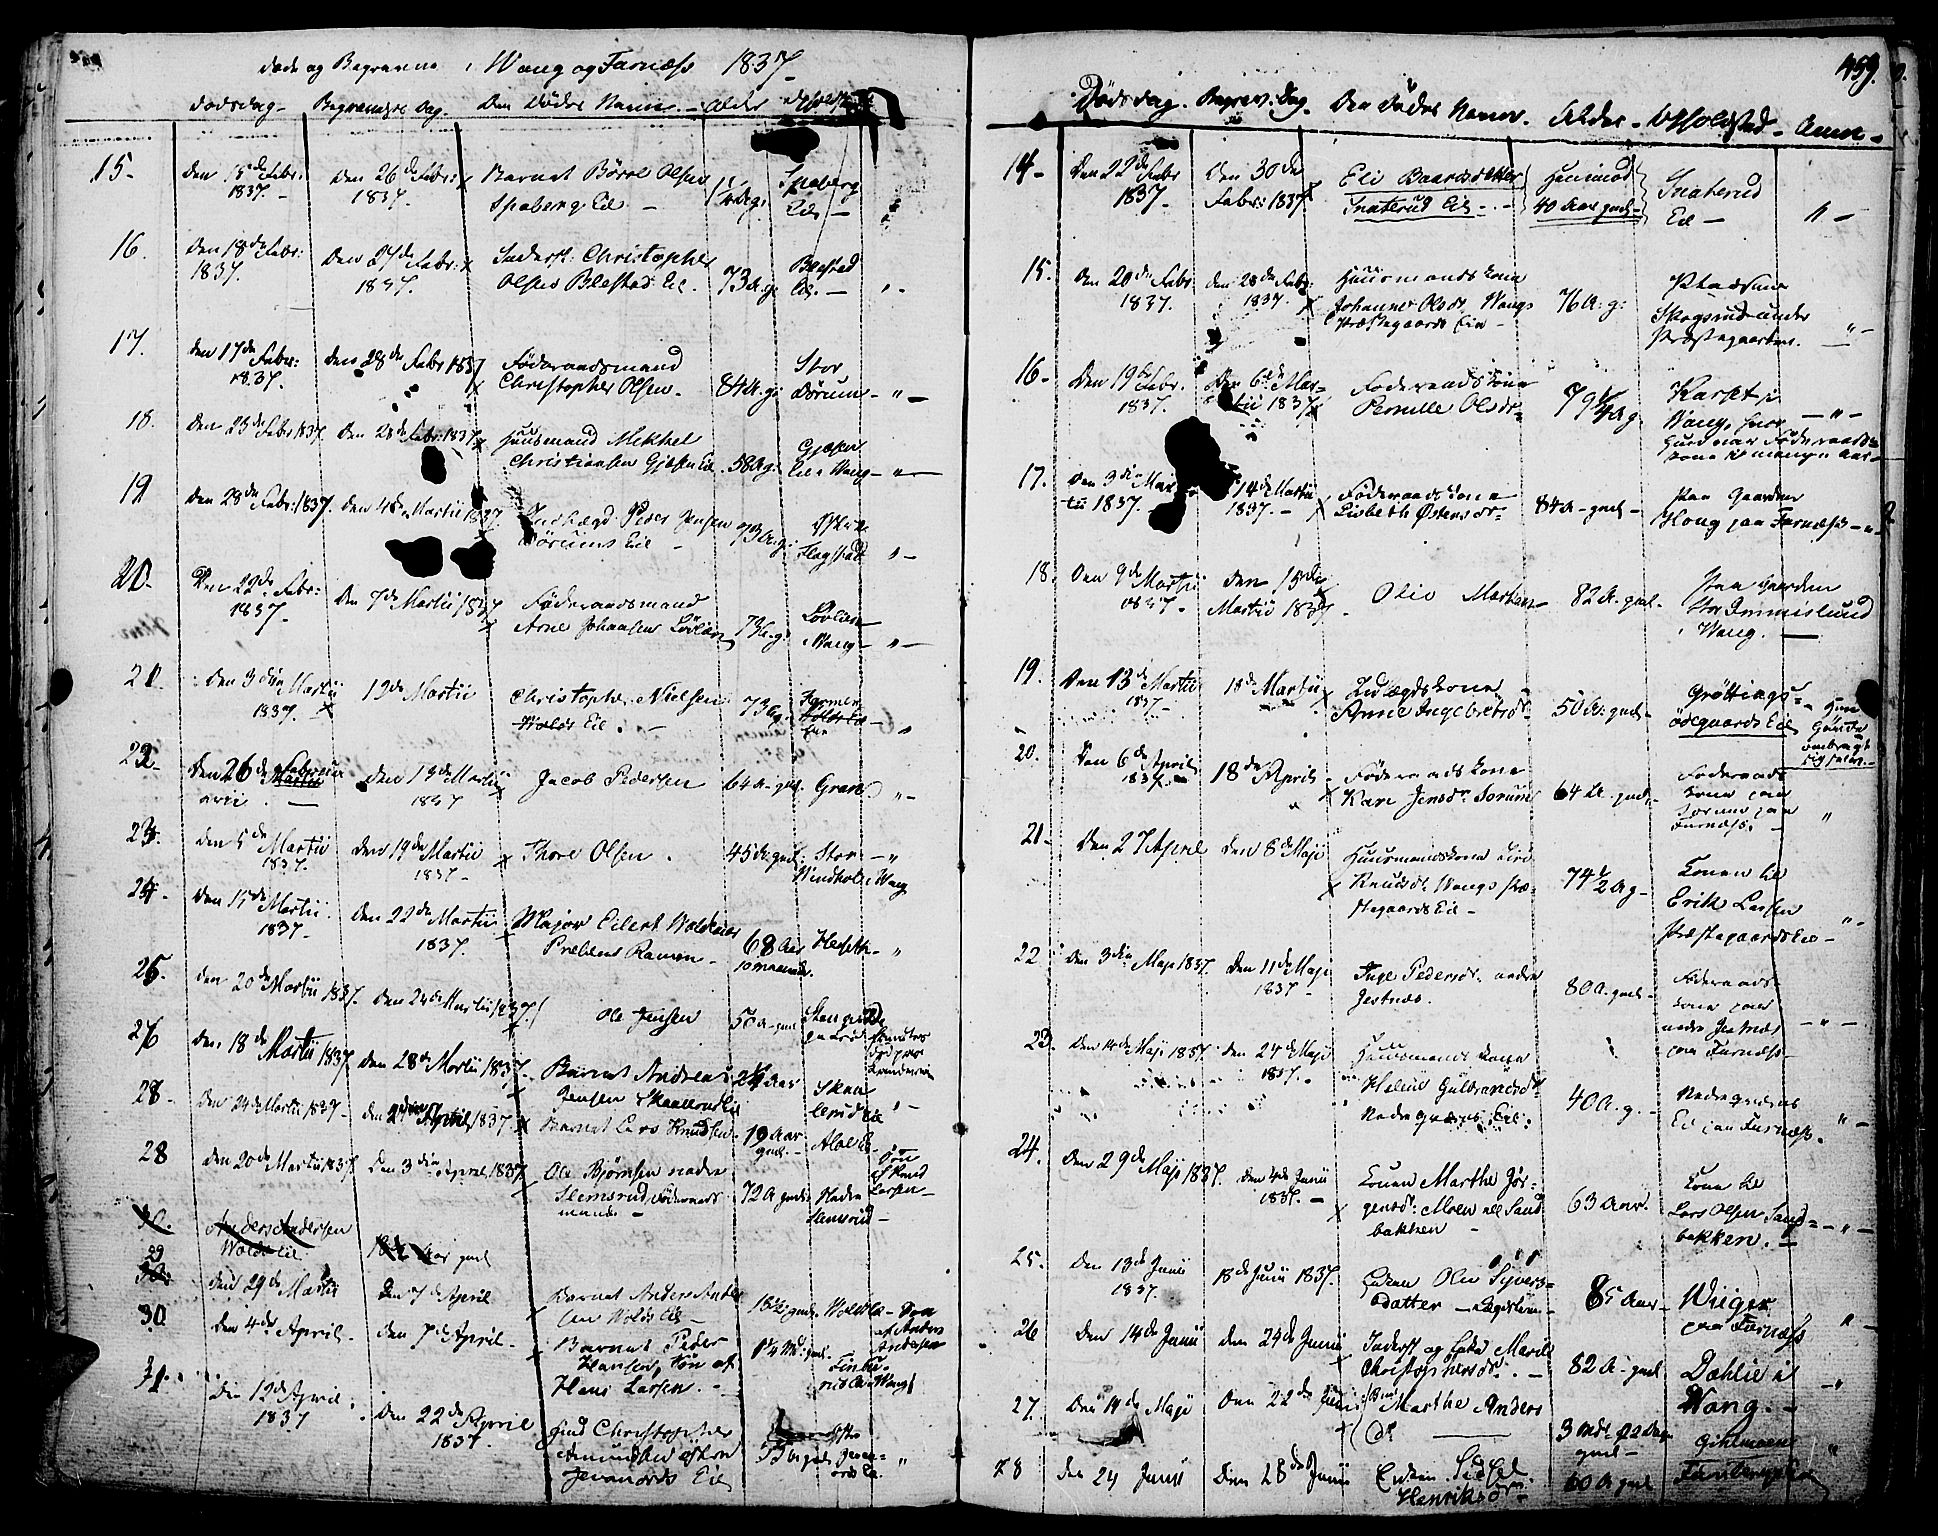 SAH, Vang prestekontor, Hedmark, H/Ha/Haa/L0009: Parish register (official) no. 9, 1826-1841, p. 459